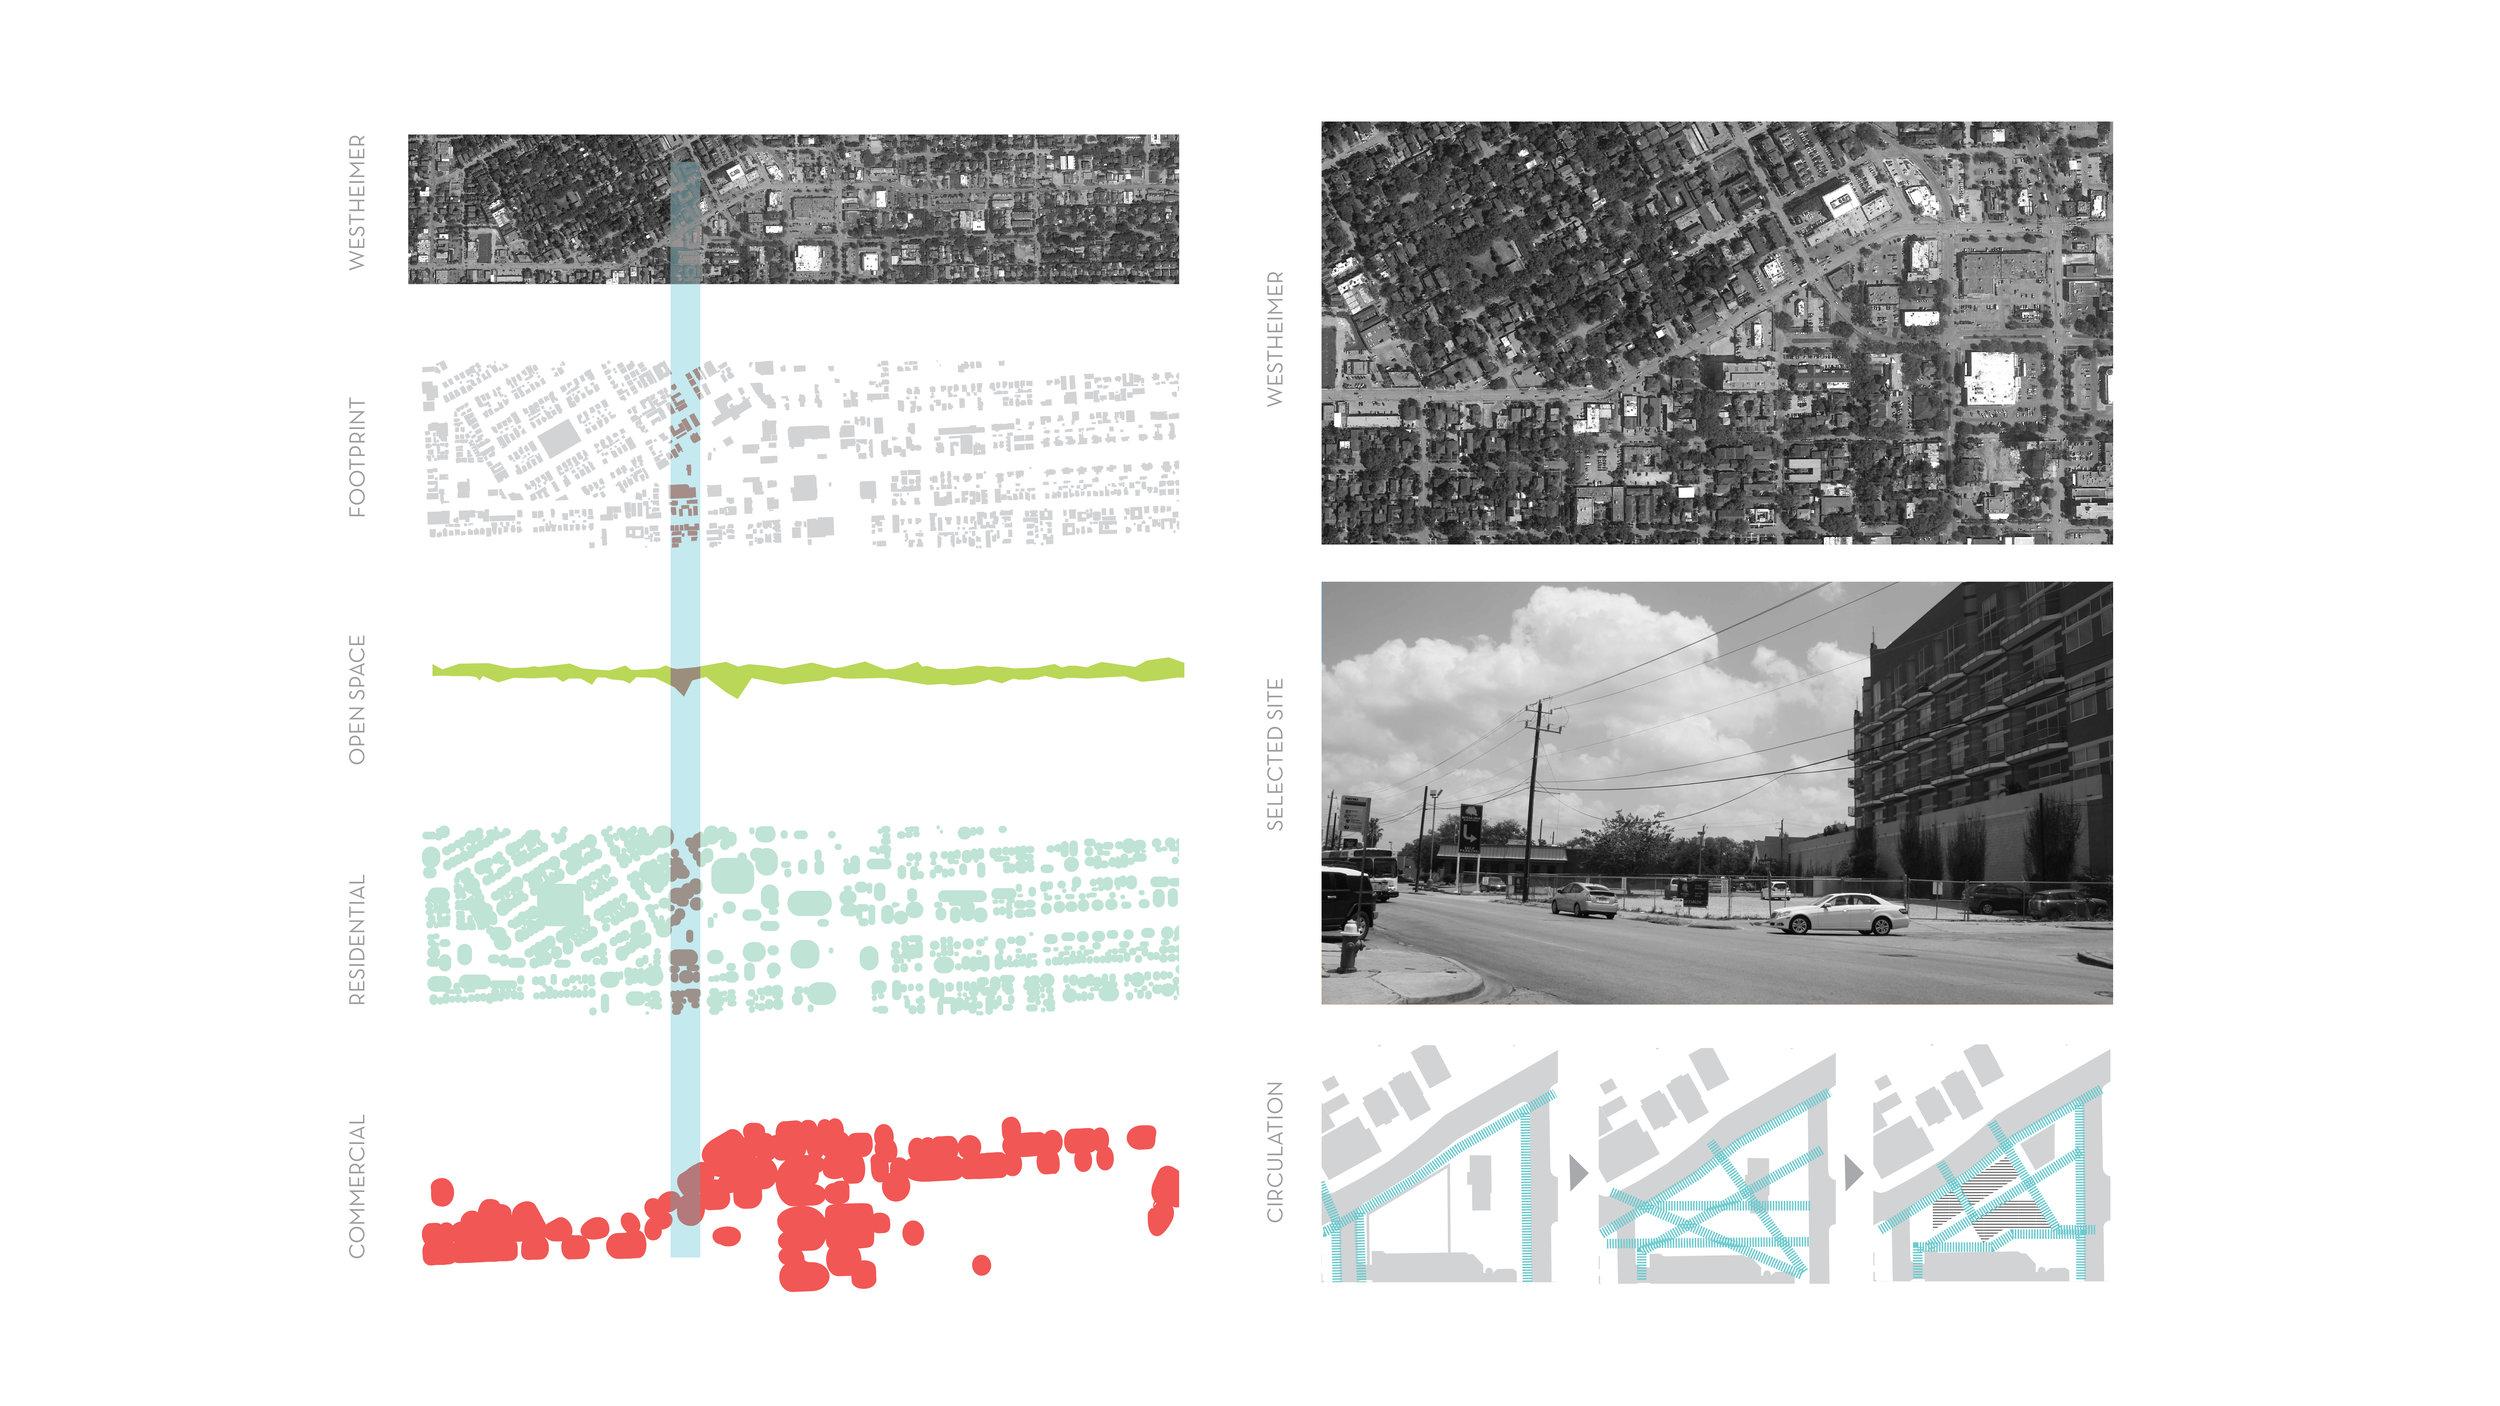 (2/7) Urban Intervention - Graduate Studio